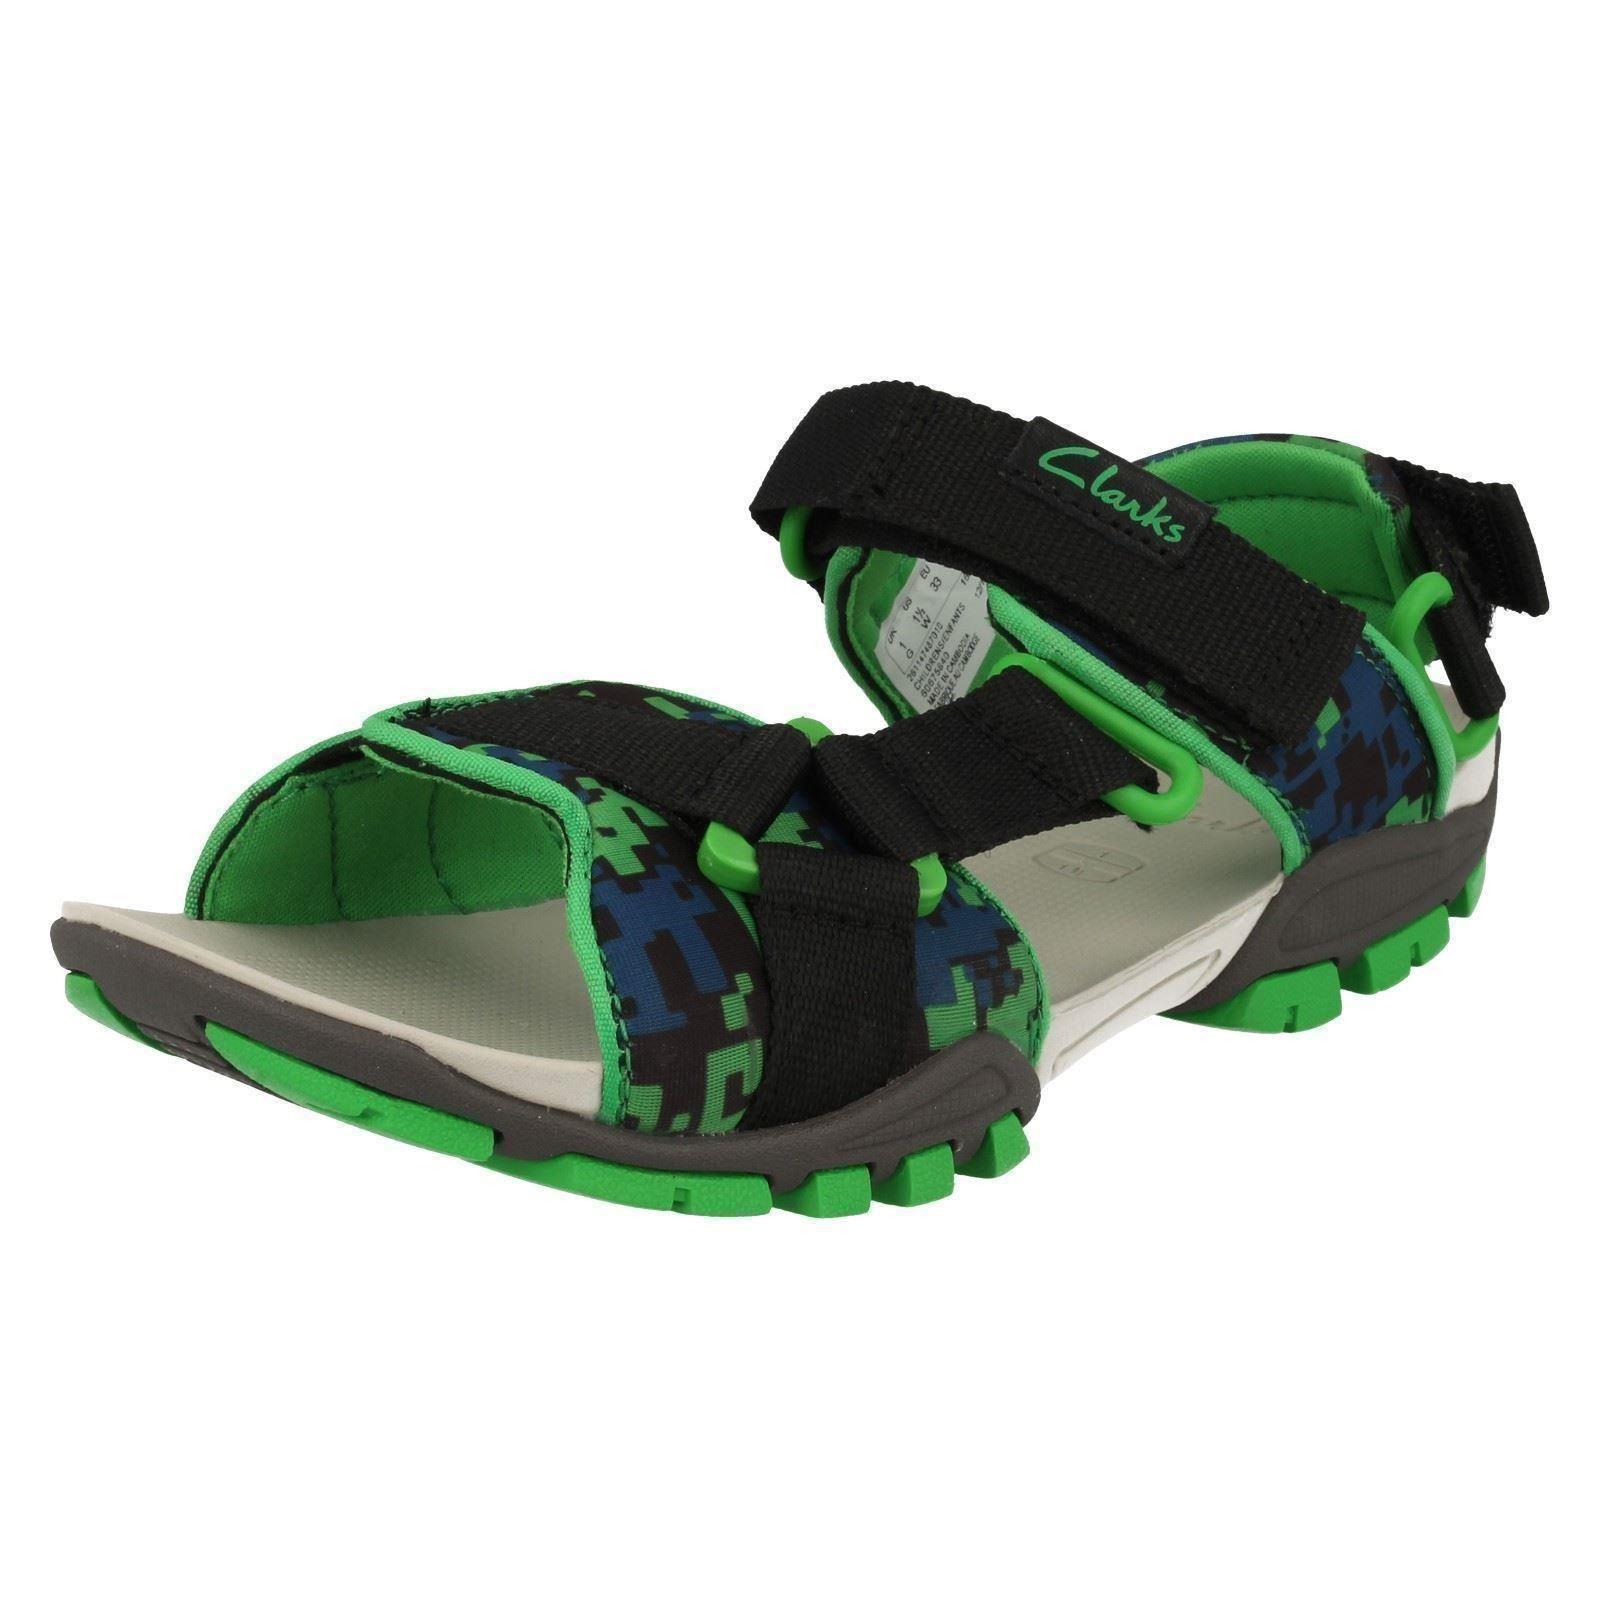 Boys Clarks Open Toe Waterfriendly Sandals ZALMO Lad 10 UK Black ... 51eb2a37289d